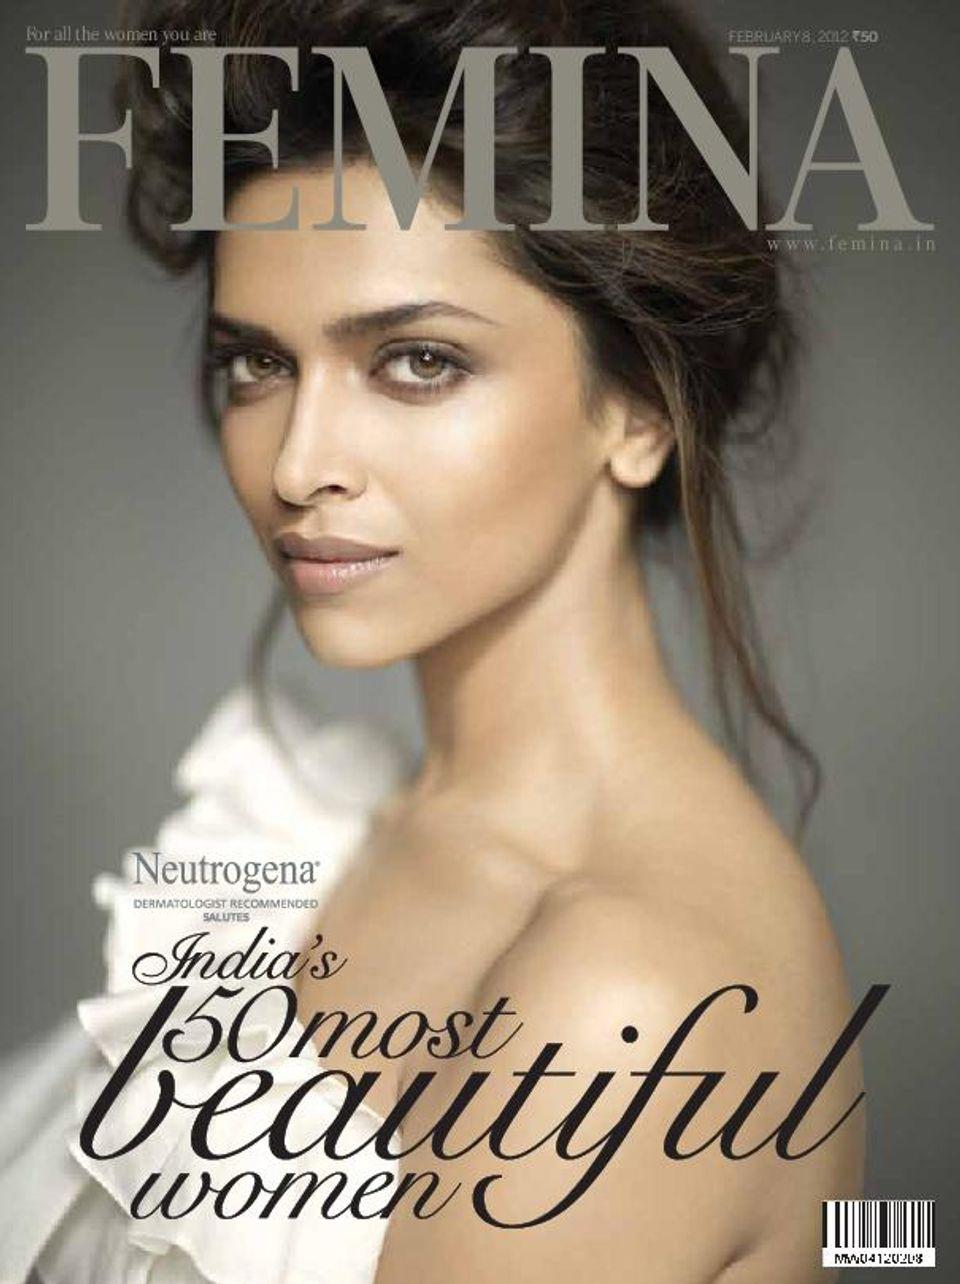 Femina (India) - Wikipedia